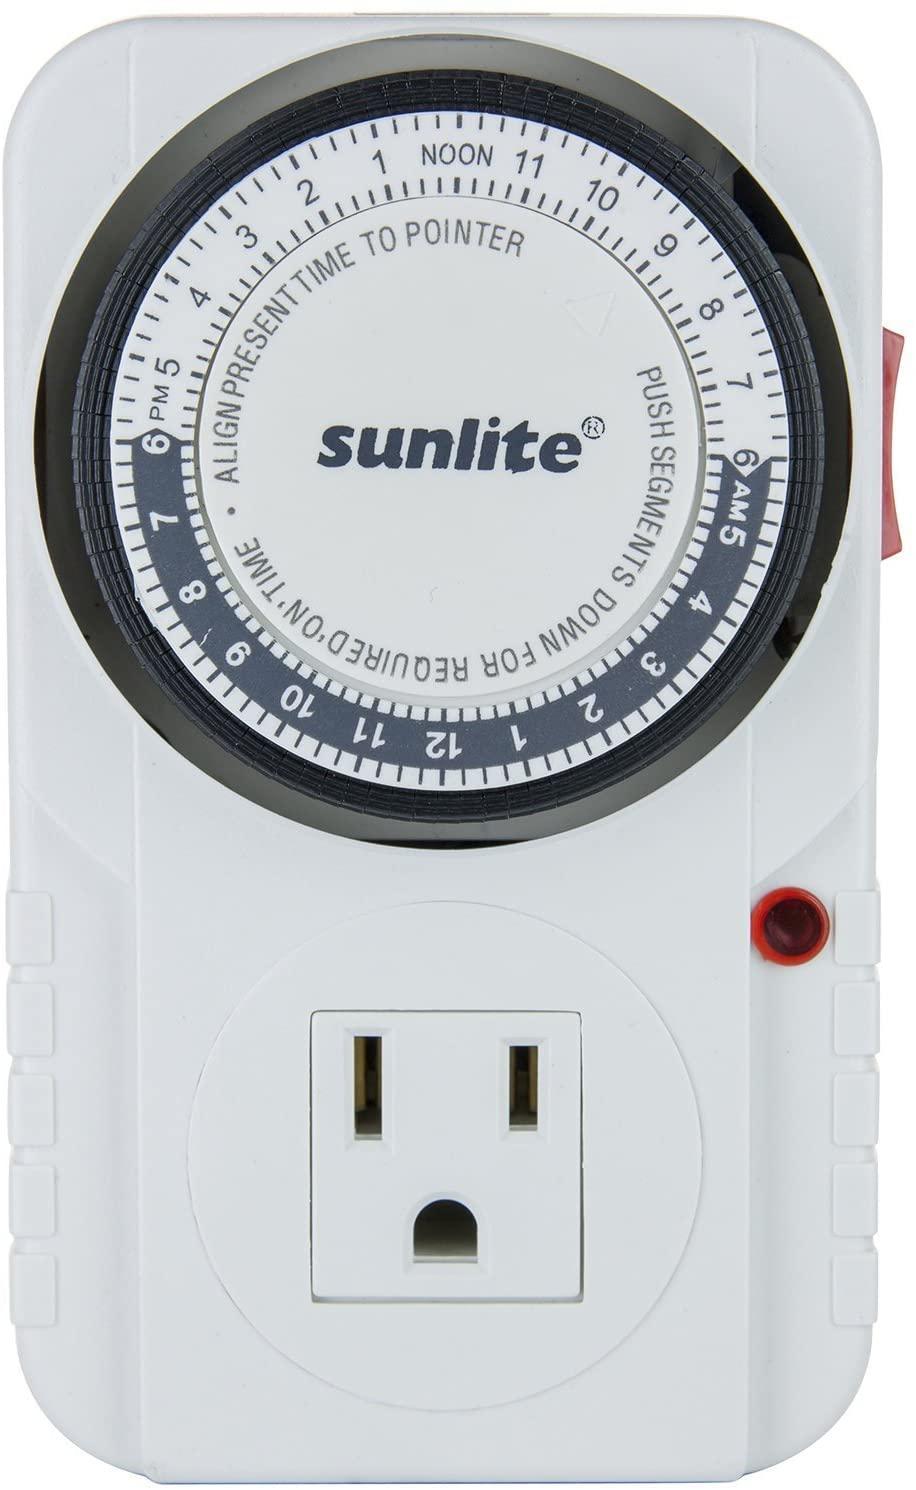 Sunlite 05003-SU T200 24 Hour Heavy Duty Appliance Timer (2 Pack)